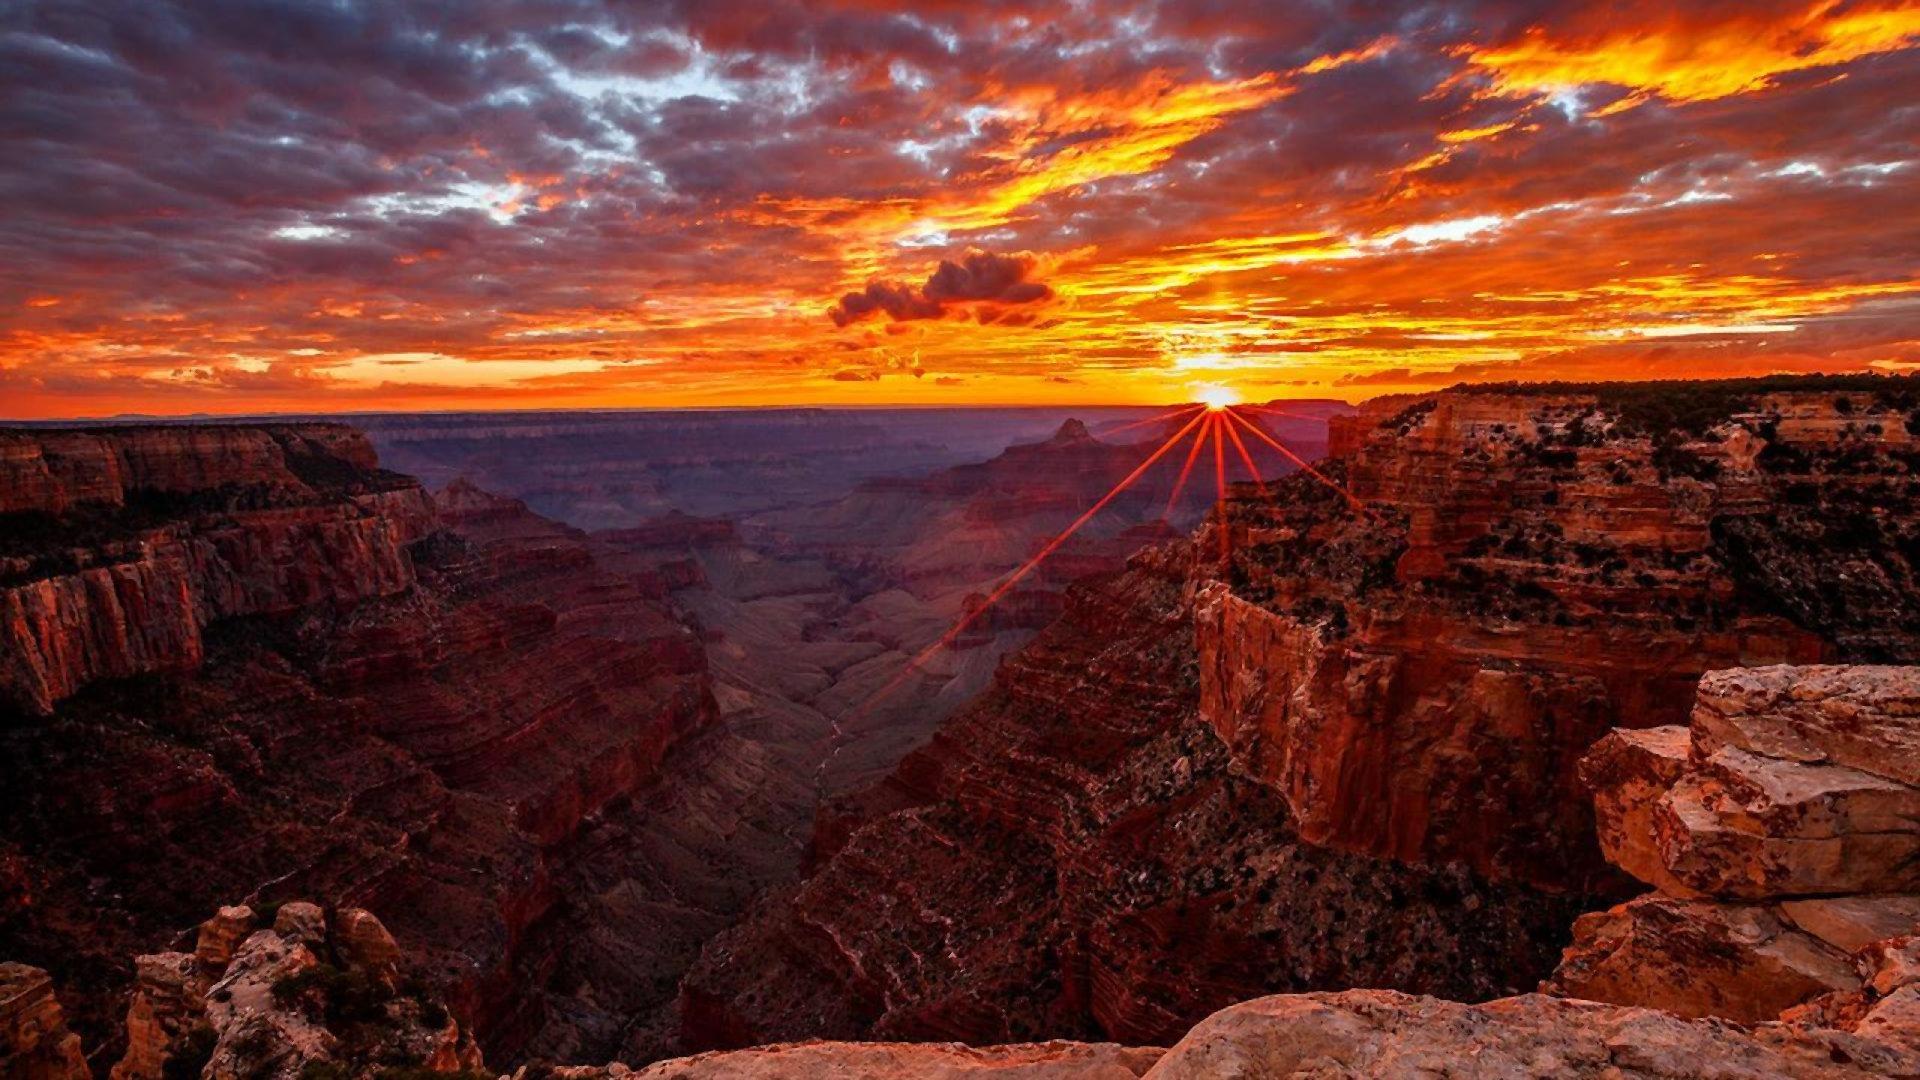 grand canyon 1920x1080 wallpaper - photo #7